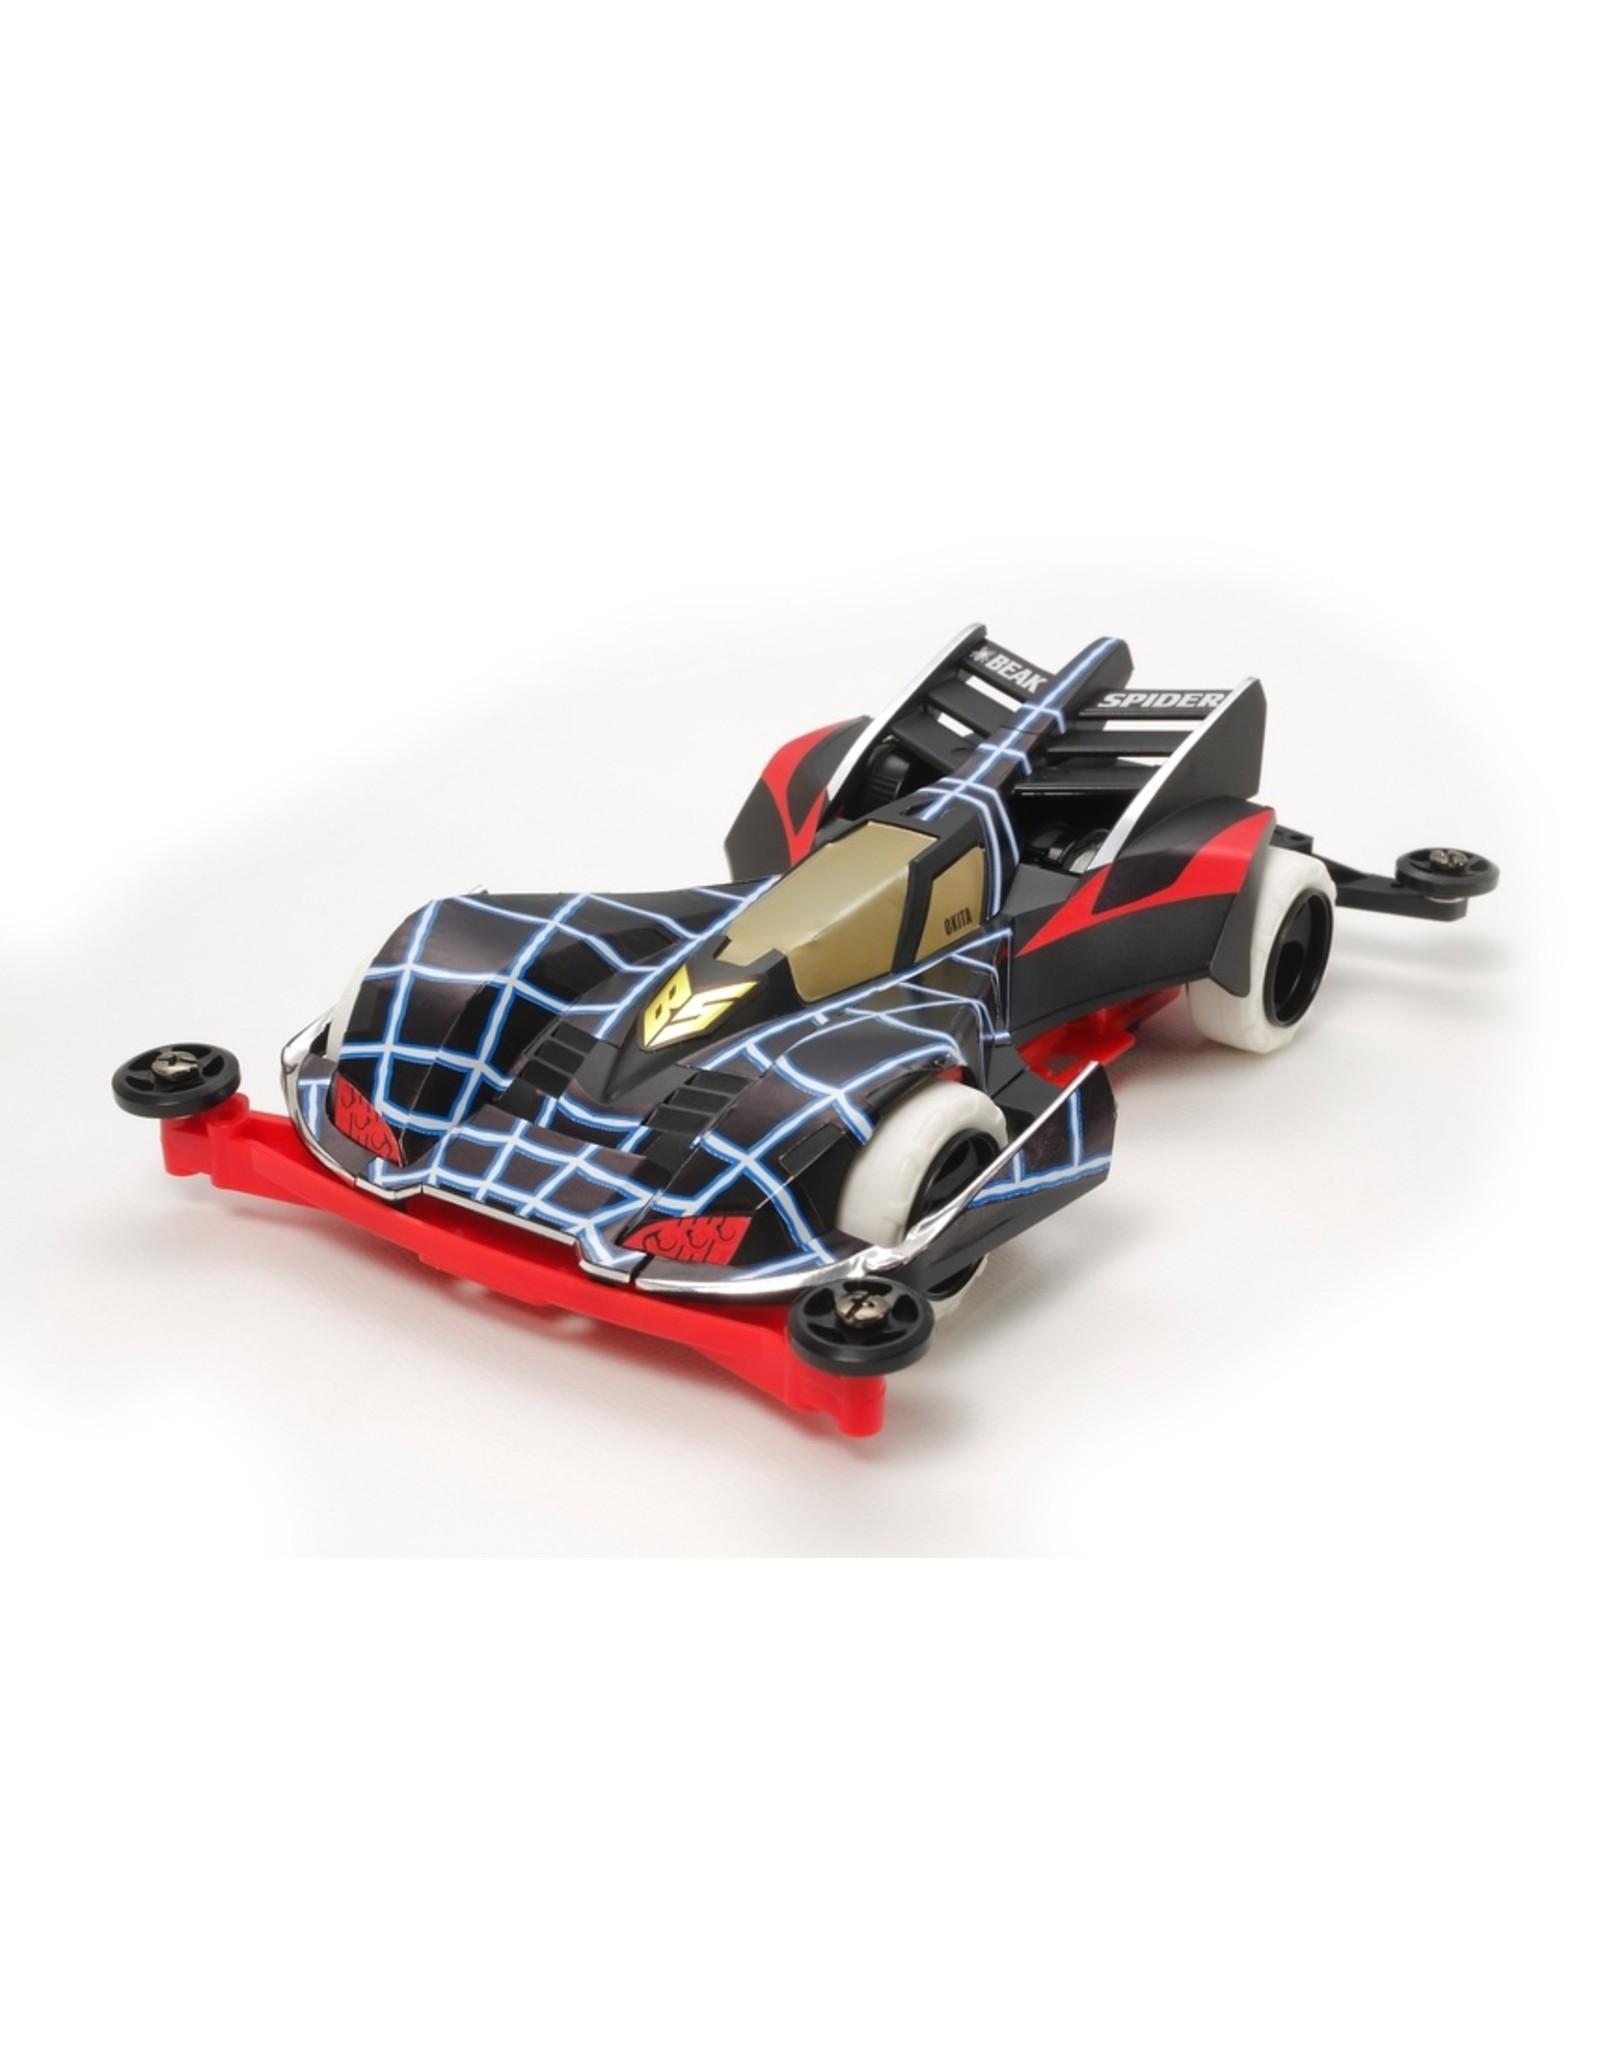 Tamiya Beak Spider Premium - SEMI-BUILT